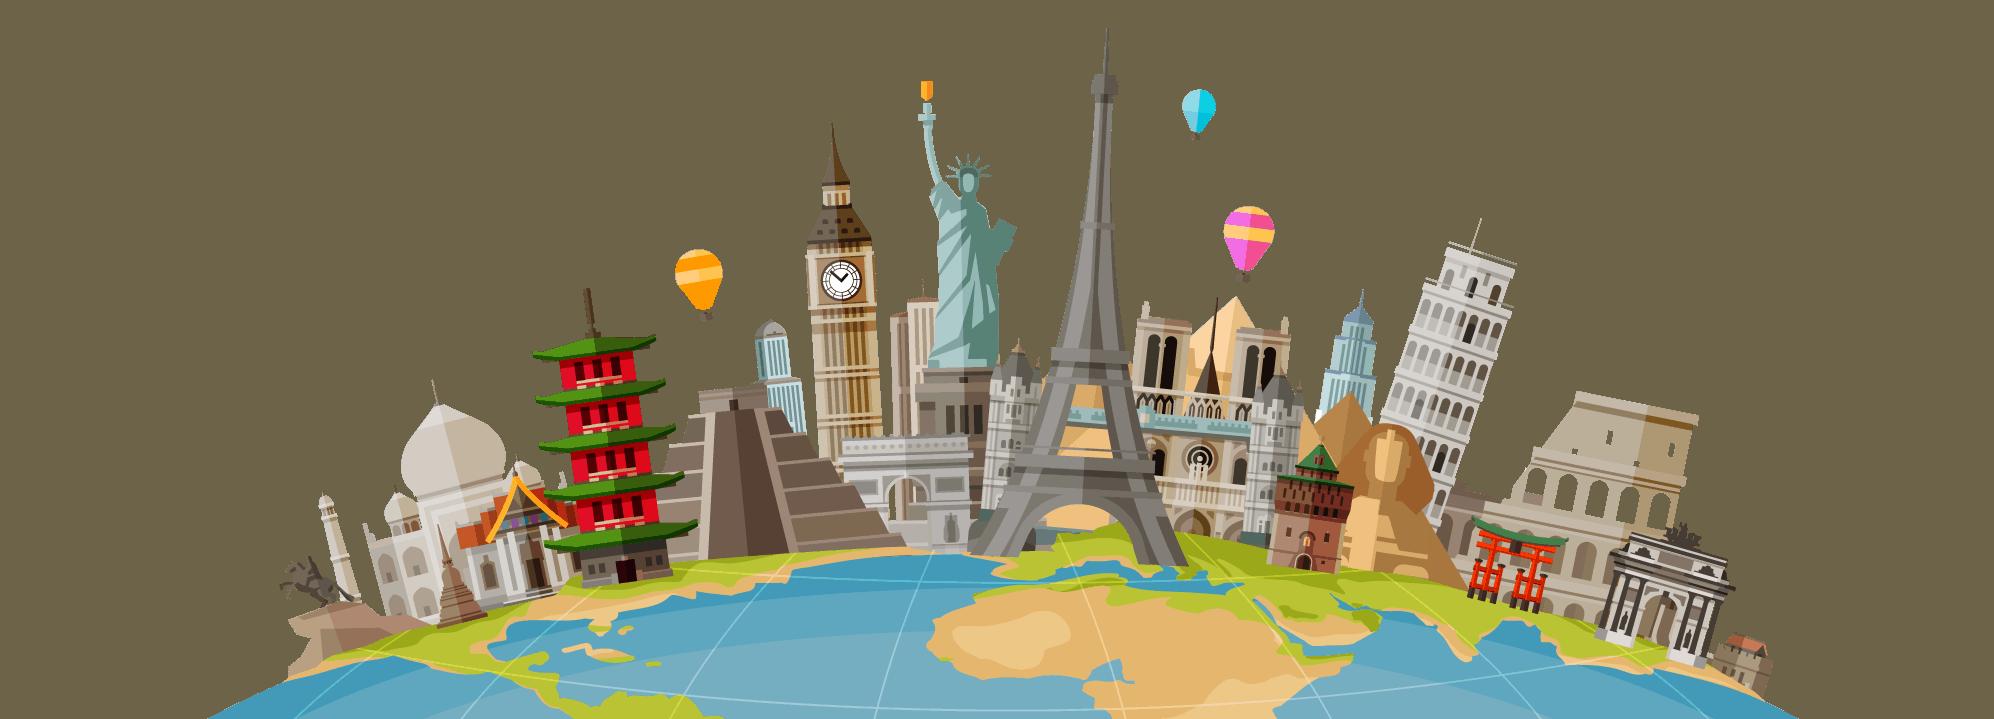 city-illustration-[Converted]